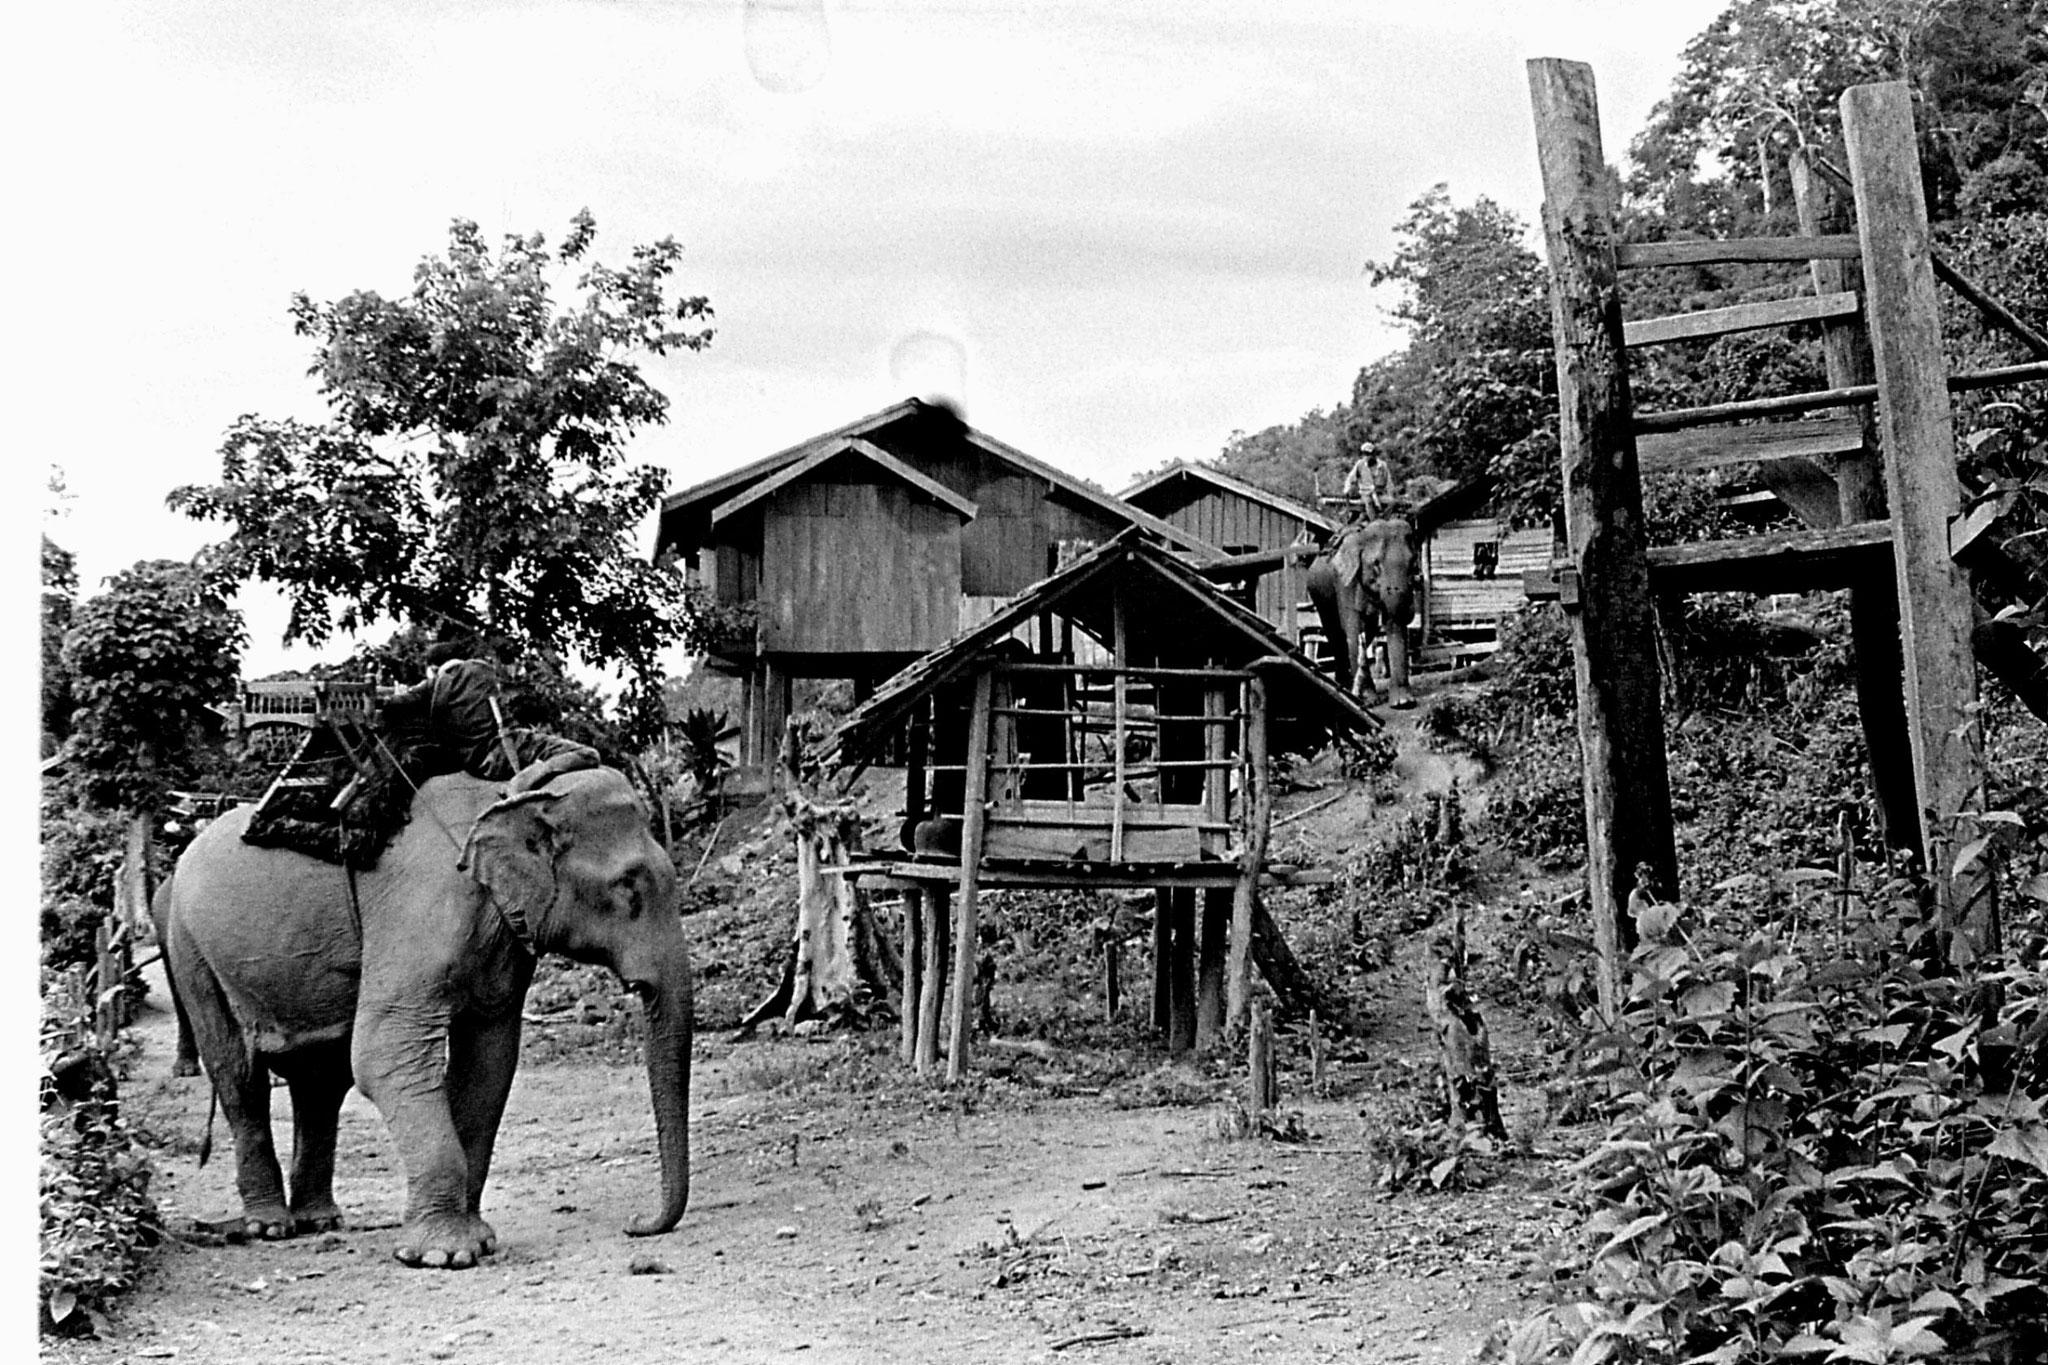 13/6/1990: 23: Last day of Trek, on elephant